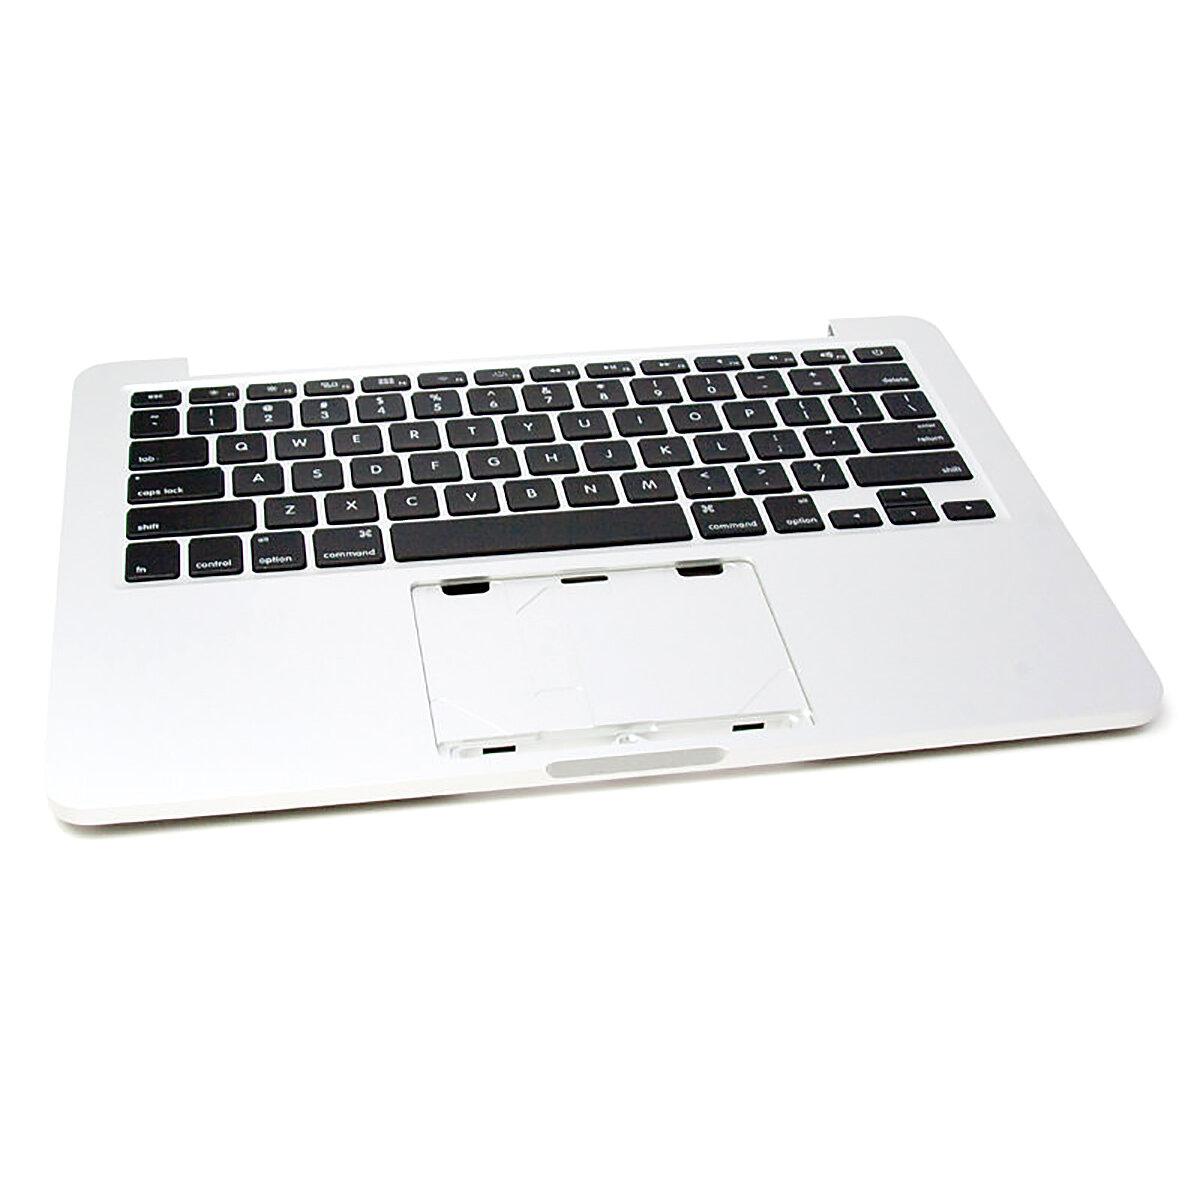 "Топкейс с клавиатурой US / корпус для MacBook Pro 13"" Retina A1425 Late 2012, Early 2013"